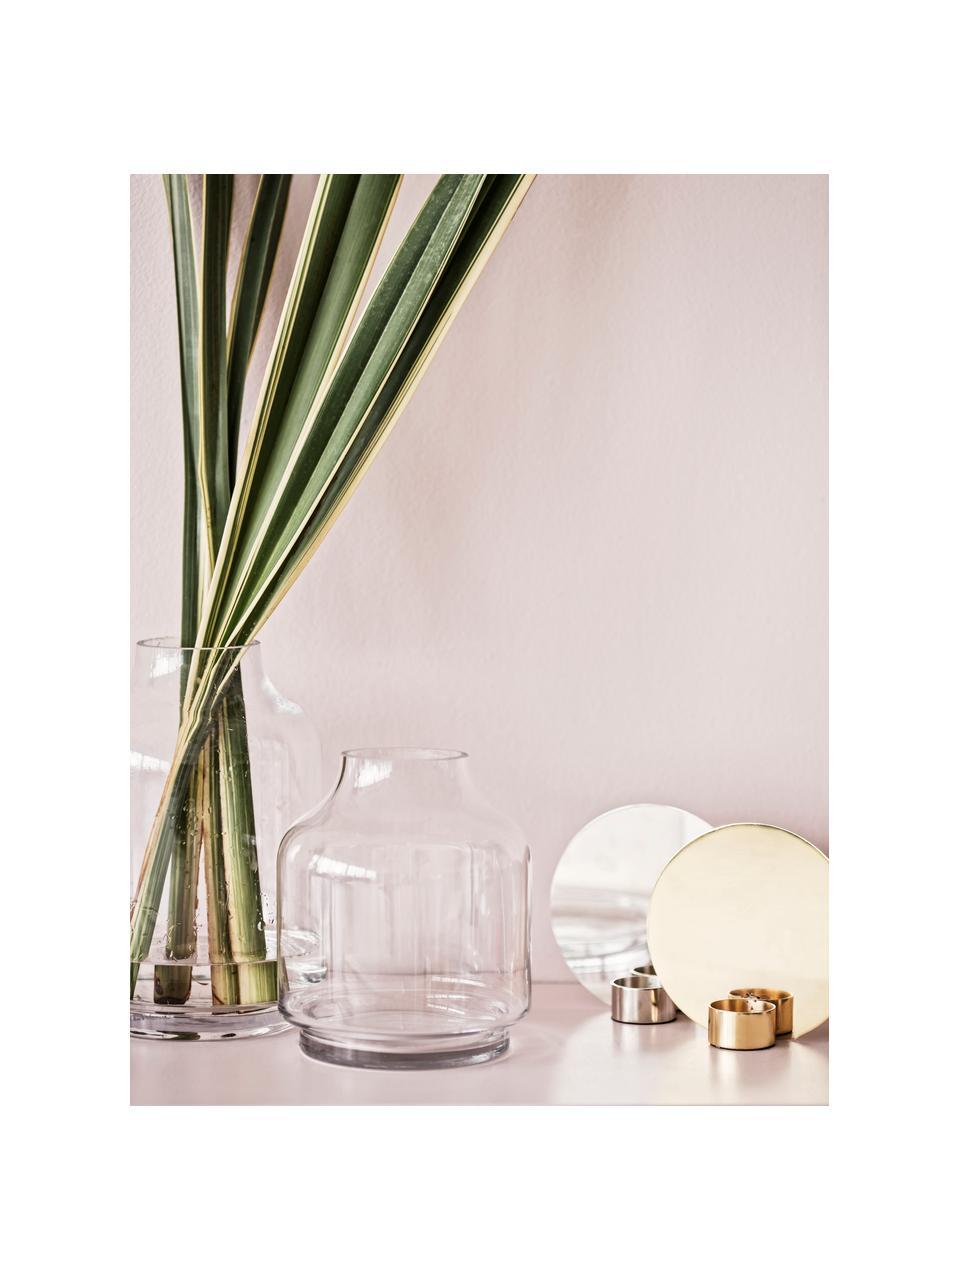 Glas-Vase Vibeke, Glas, Transparent, Ø 17 x H 26 cm